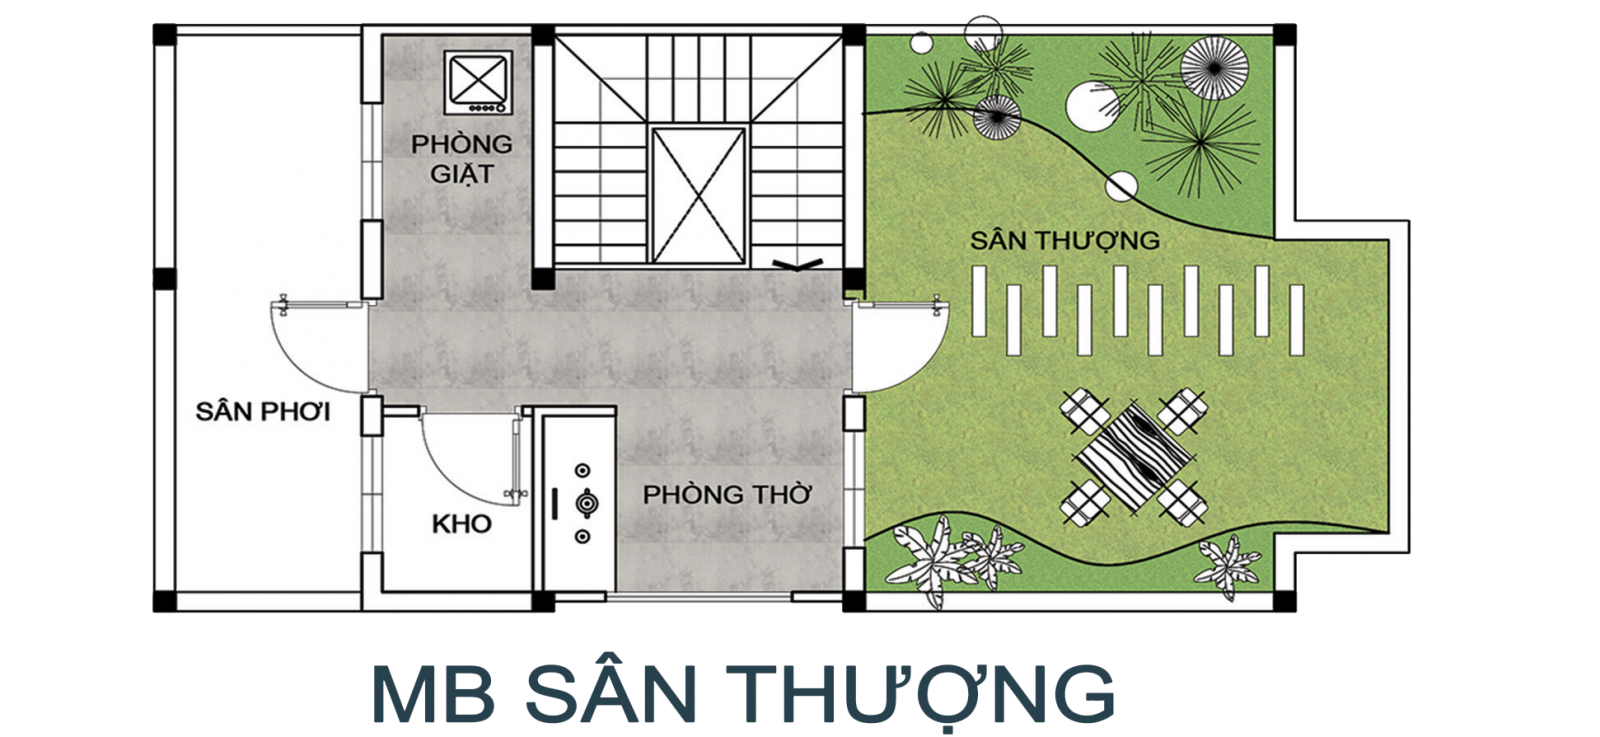 thiet-ke-nha-pho-khu-dan-cu-thien-nam-residence-quan-12